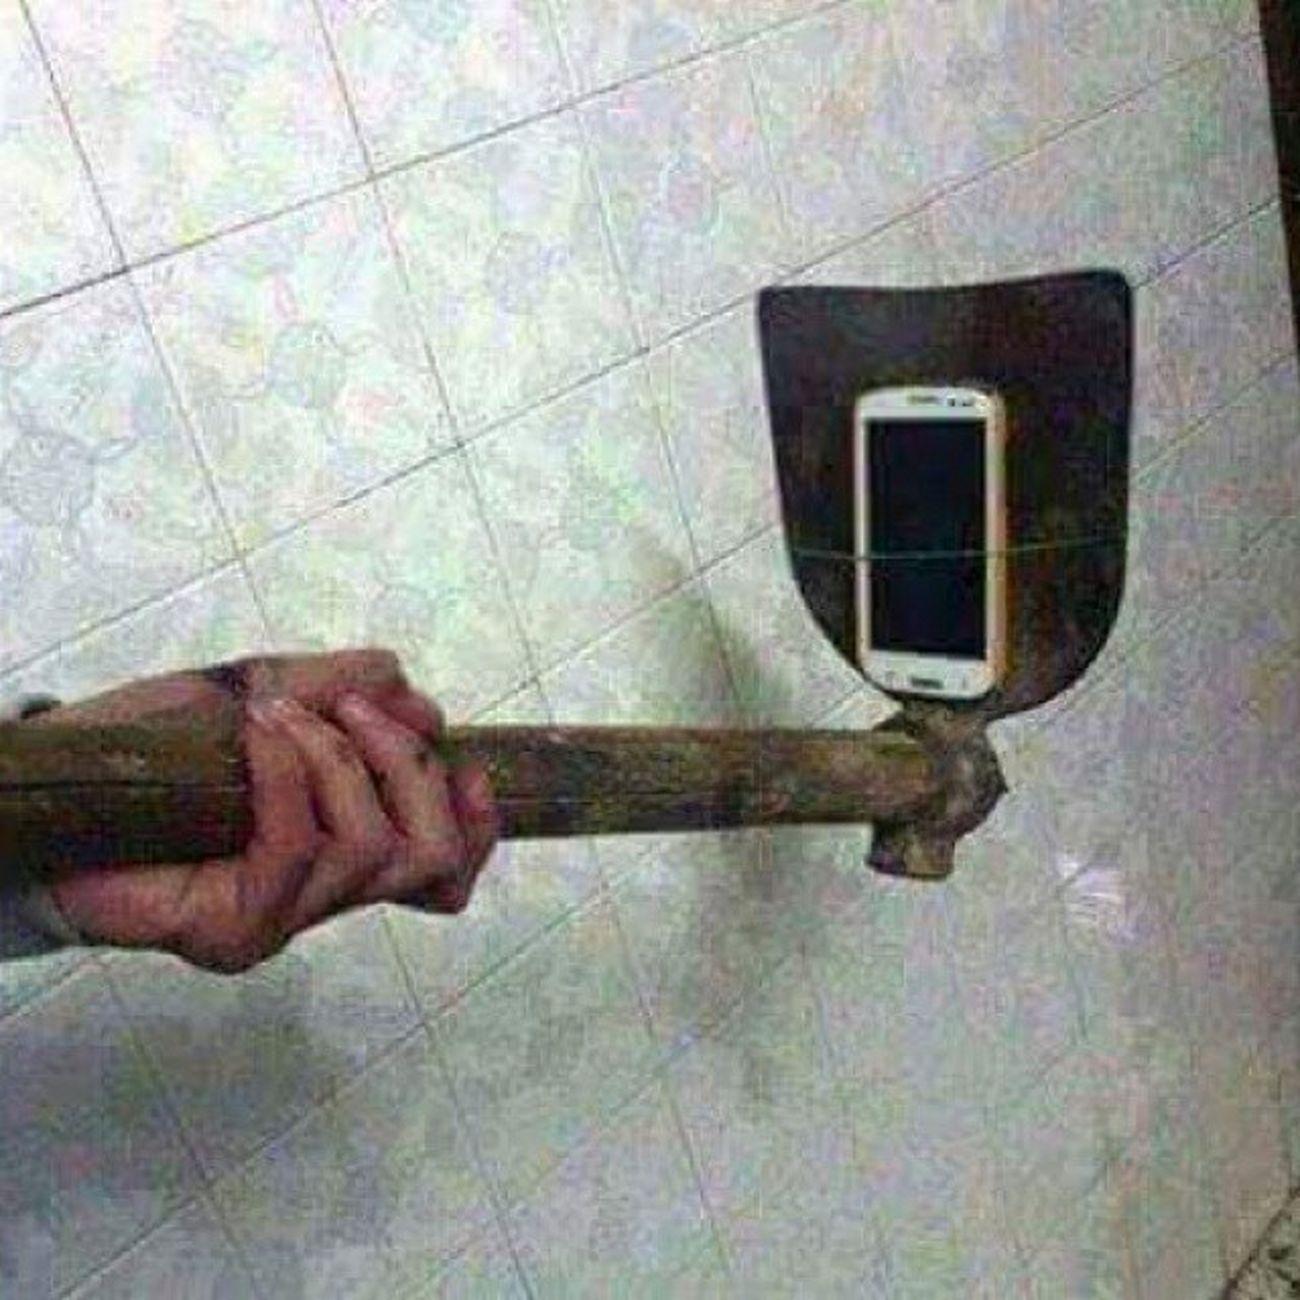 Selfie Stick :p